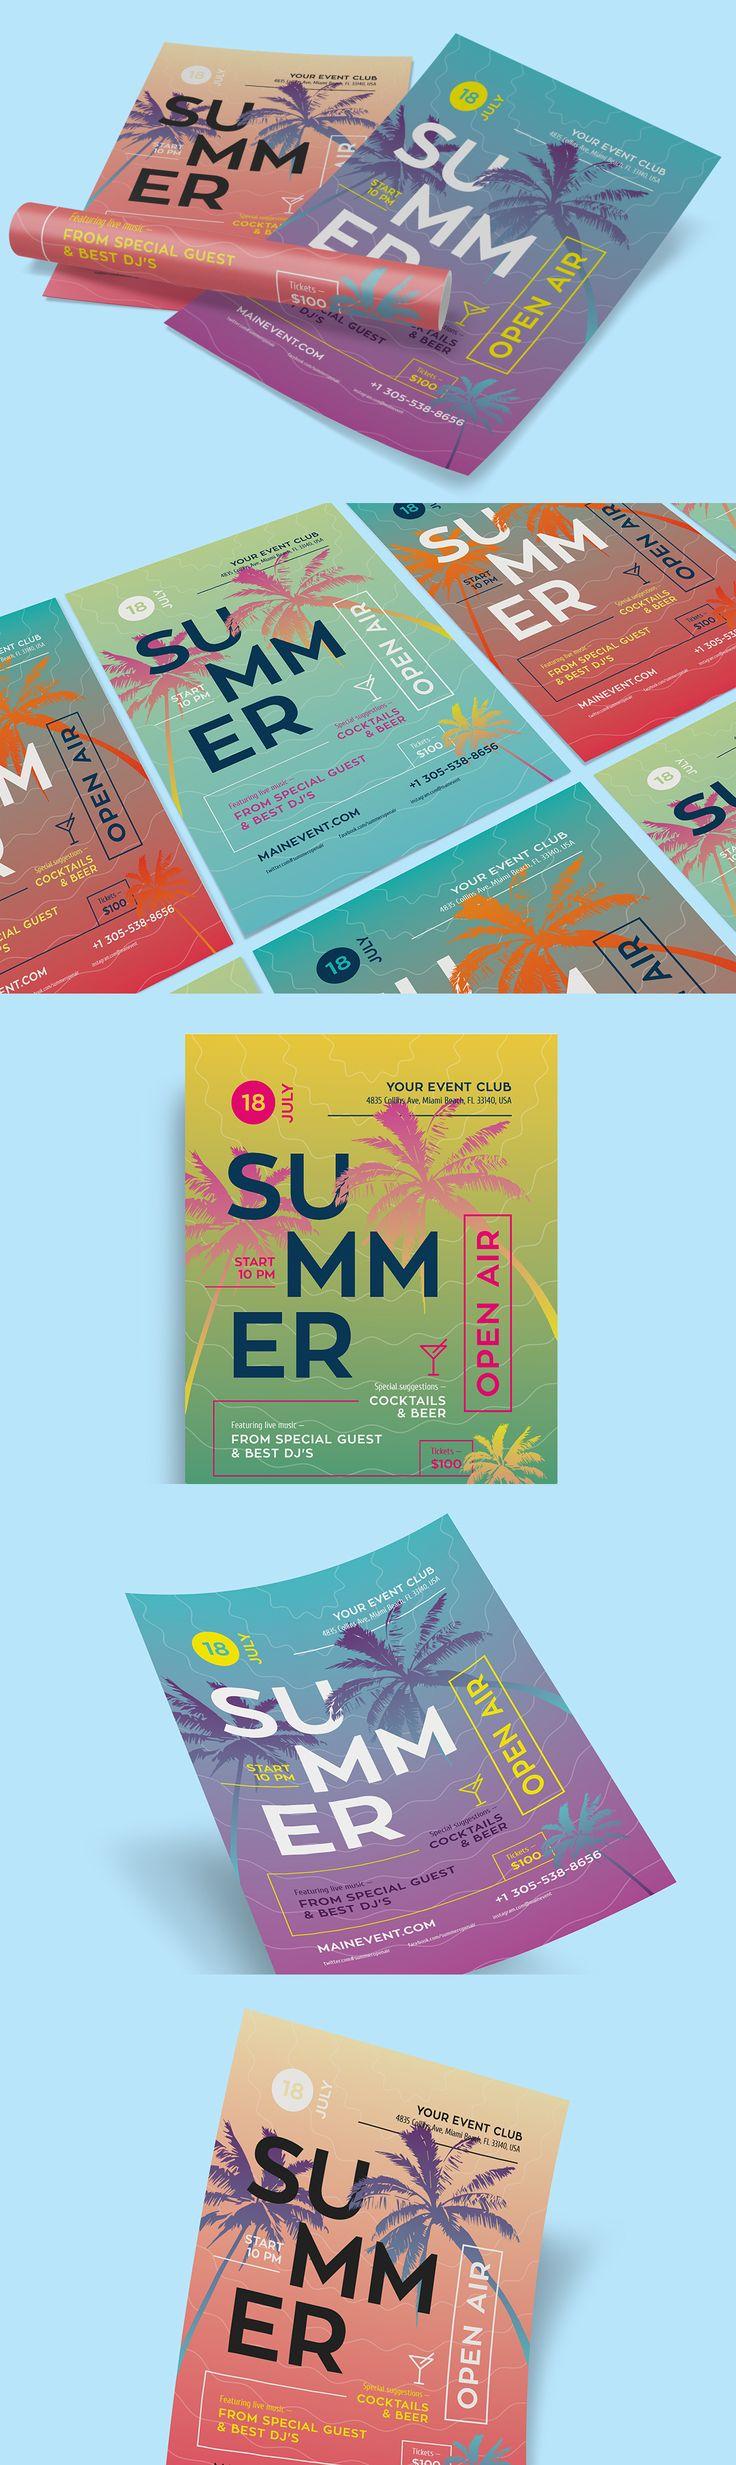 Summer Flyer / Poster Template AI, EPS